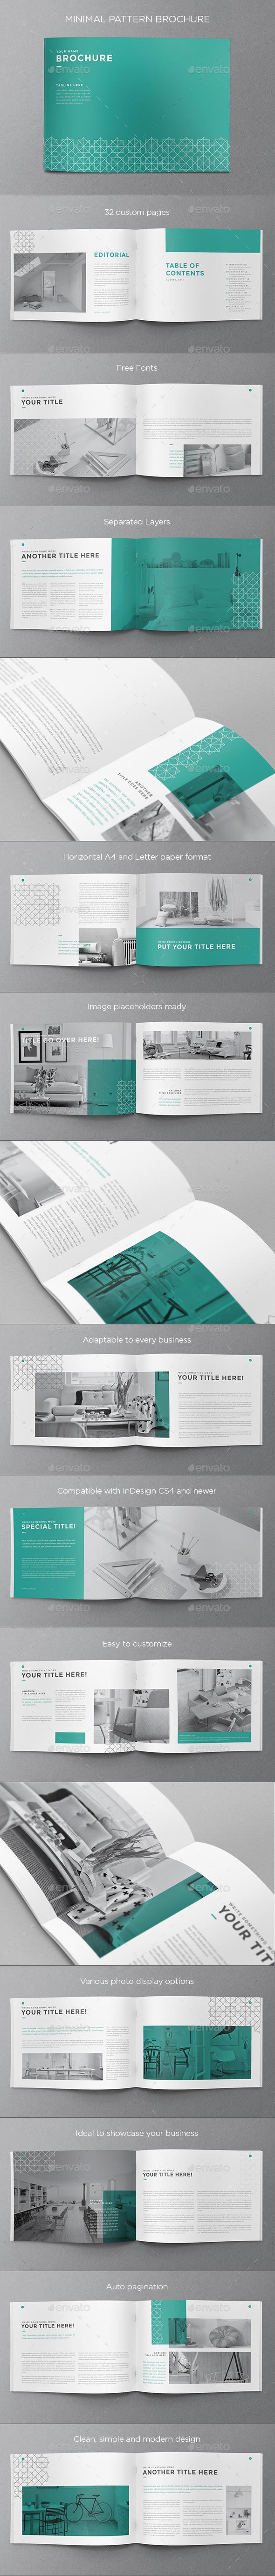 Minimal Pattern Brochure - Brochures Print Templates